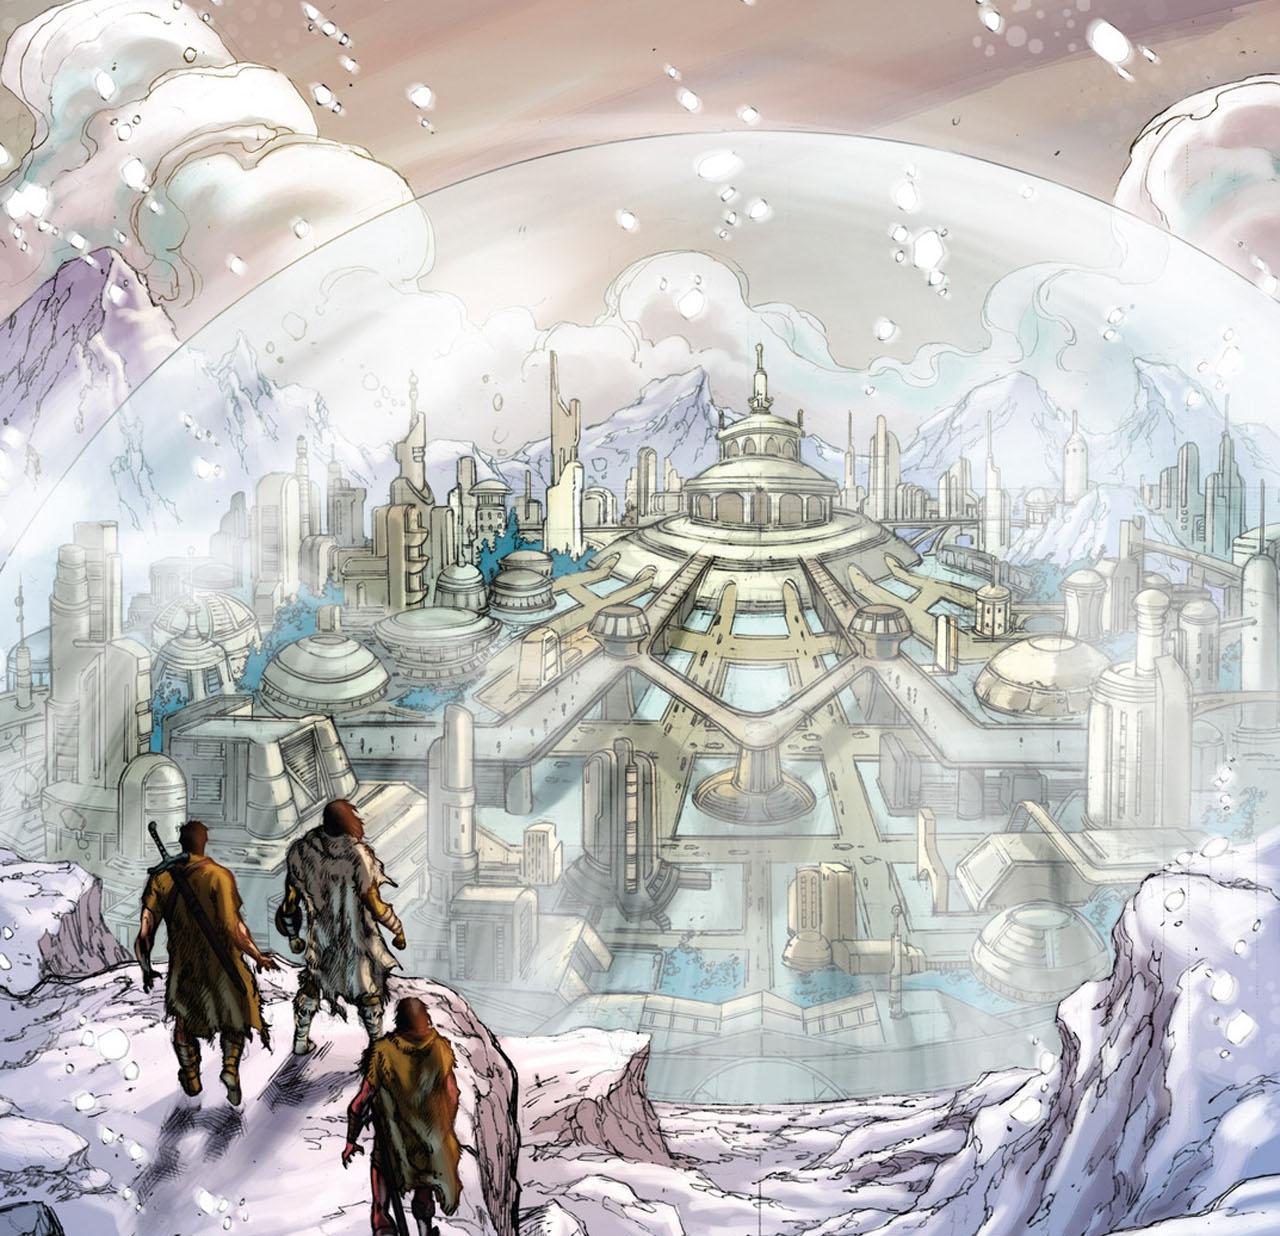 John Carter of Mars | All The Tropes Wiki | FANDOM powered ...